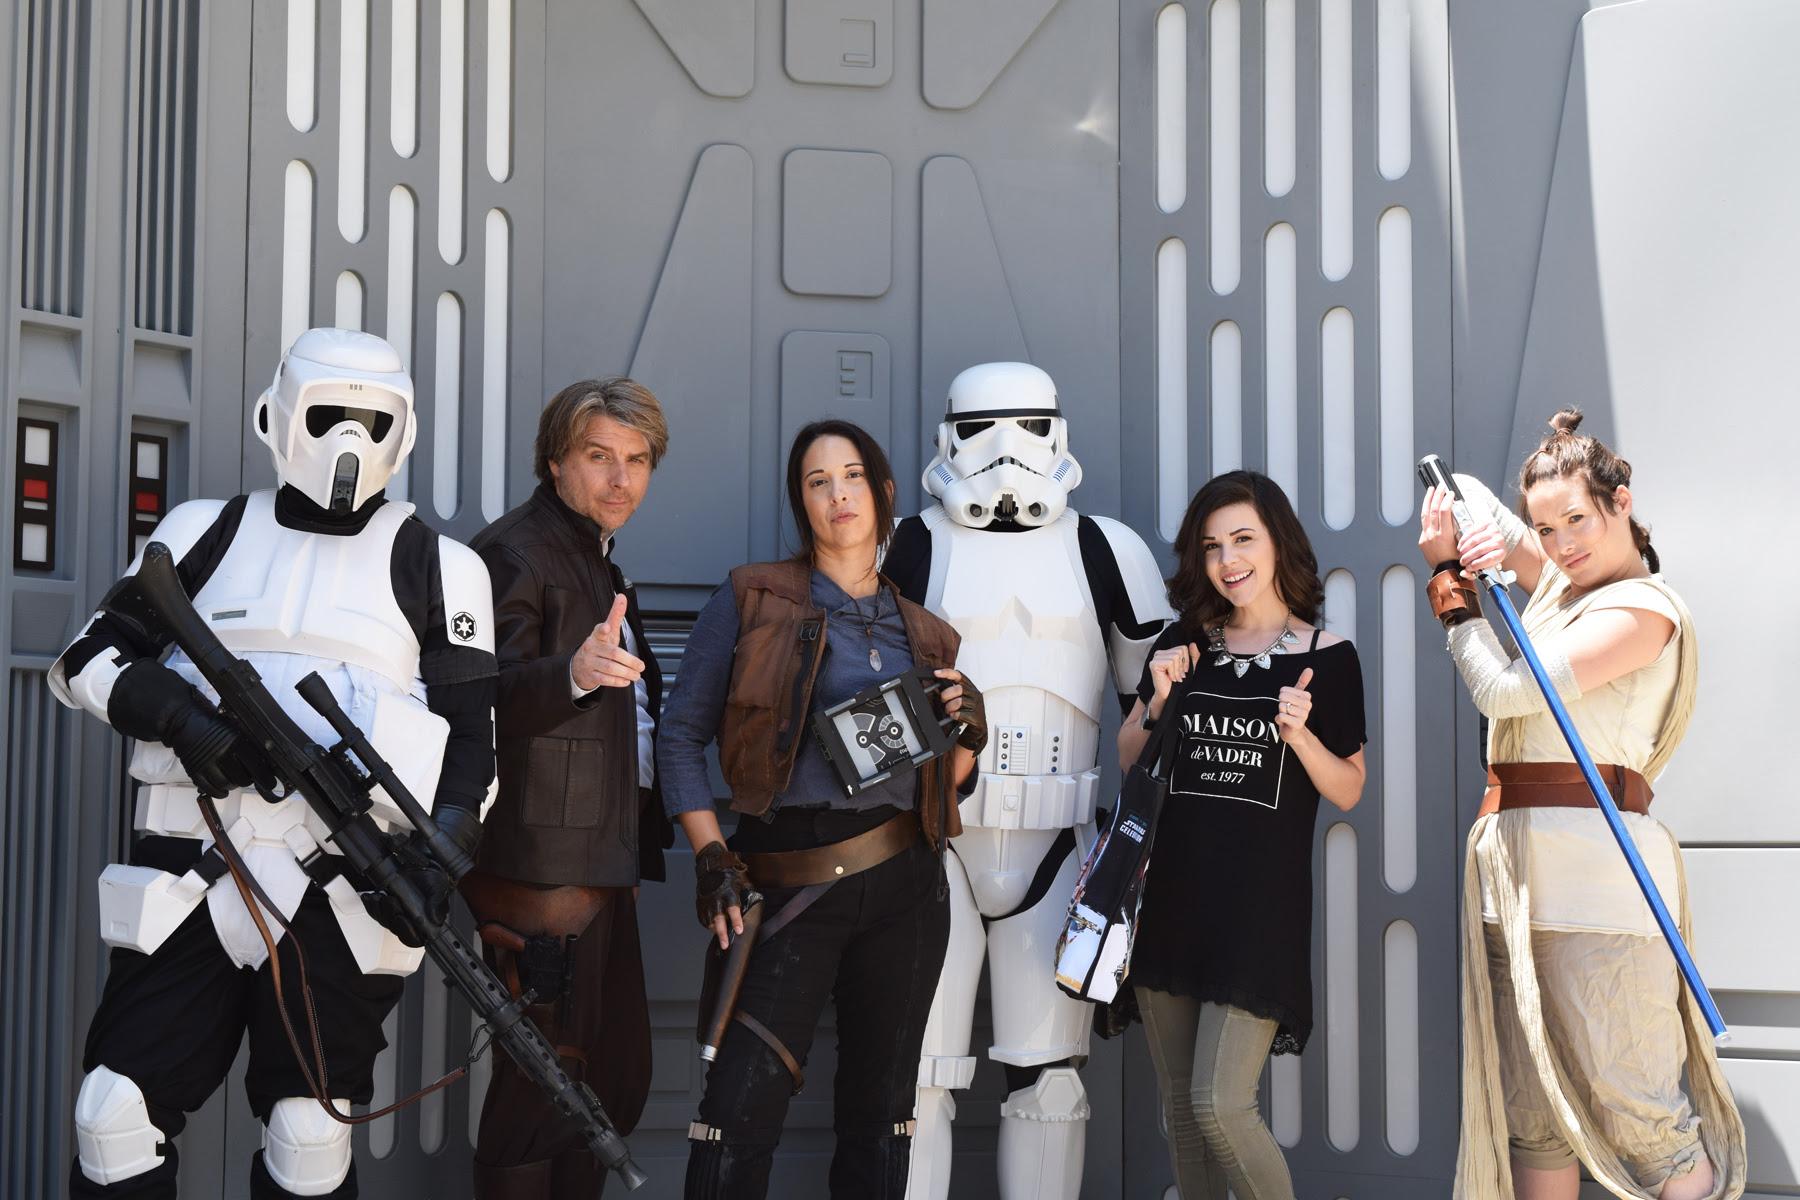 Star Wars Cosplay & Fashion At Star Wars Reads | Anakin And His Angel